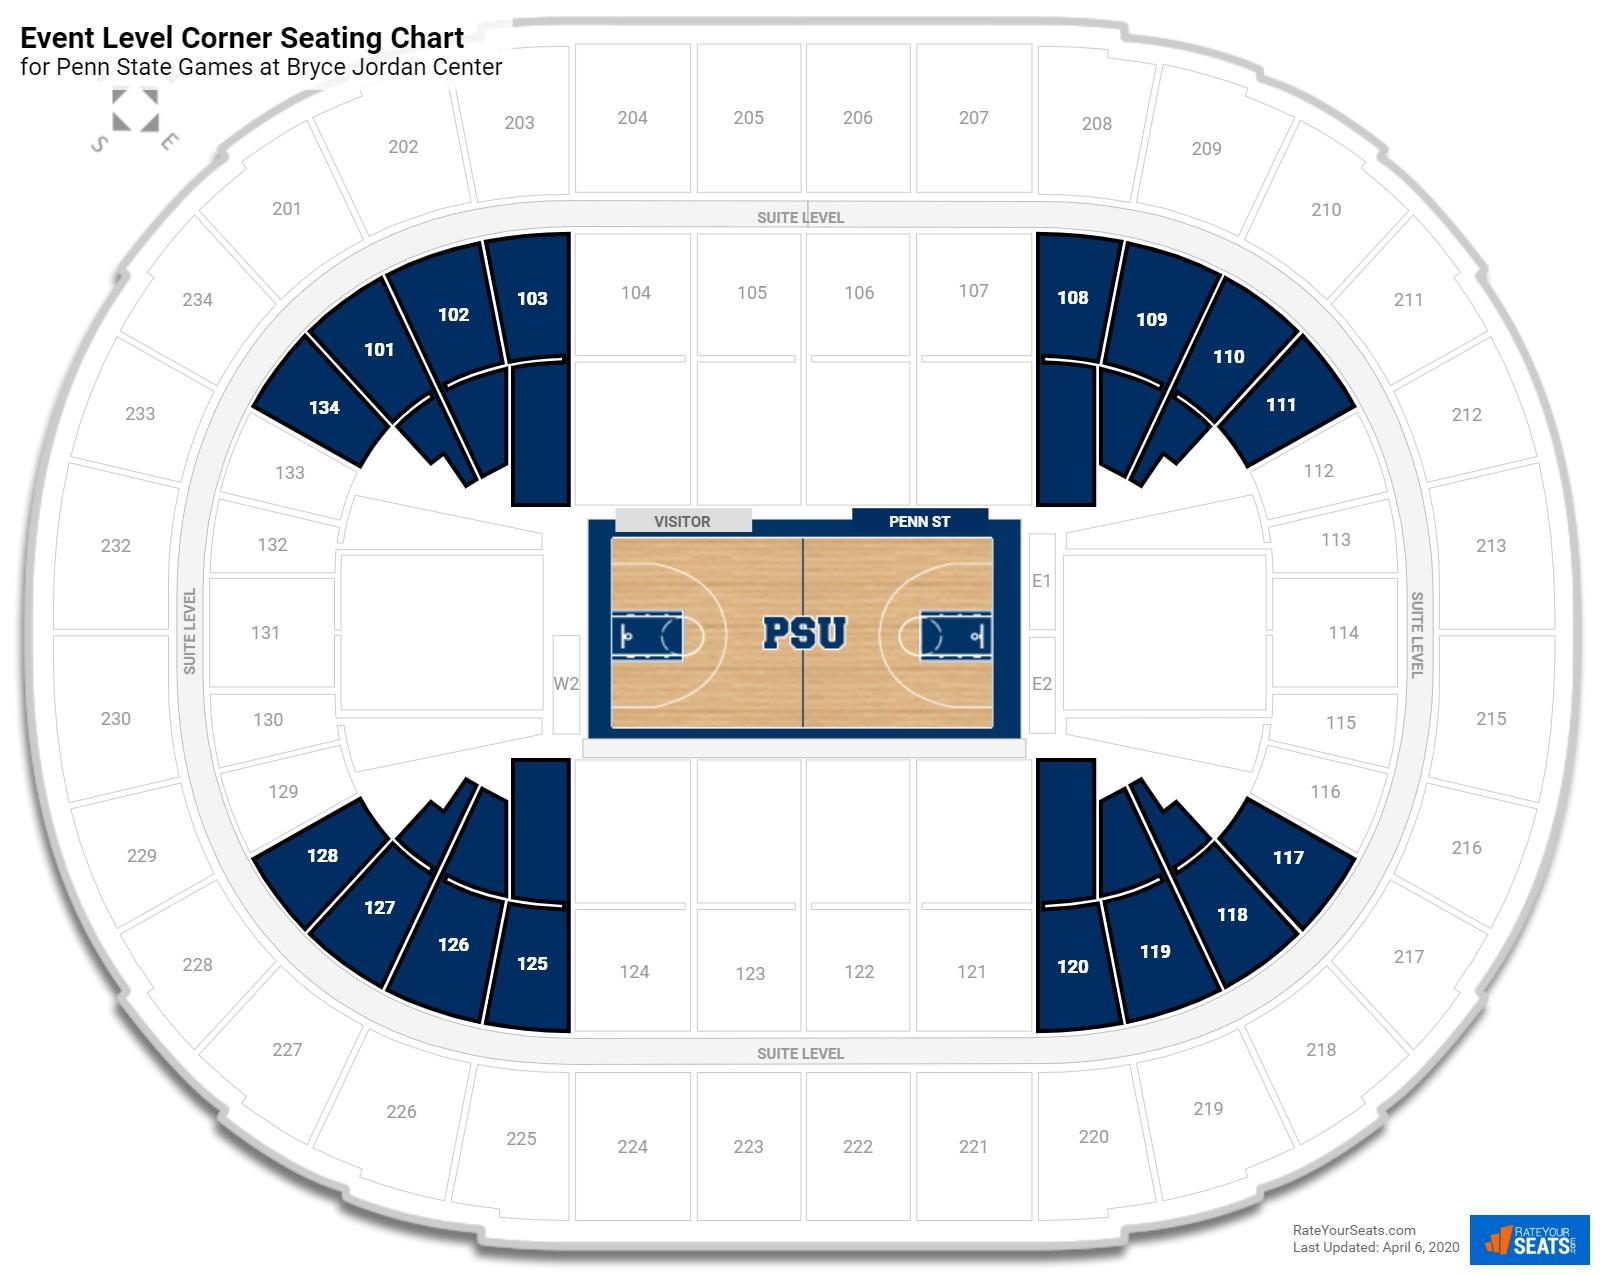 Bryce jordan center penn state seating guide rateyourseats com